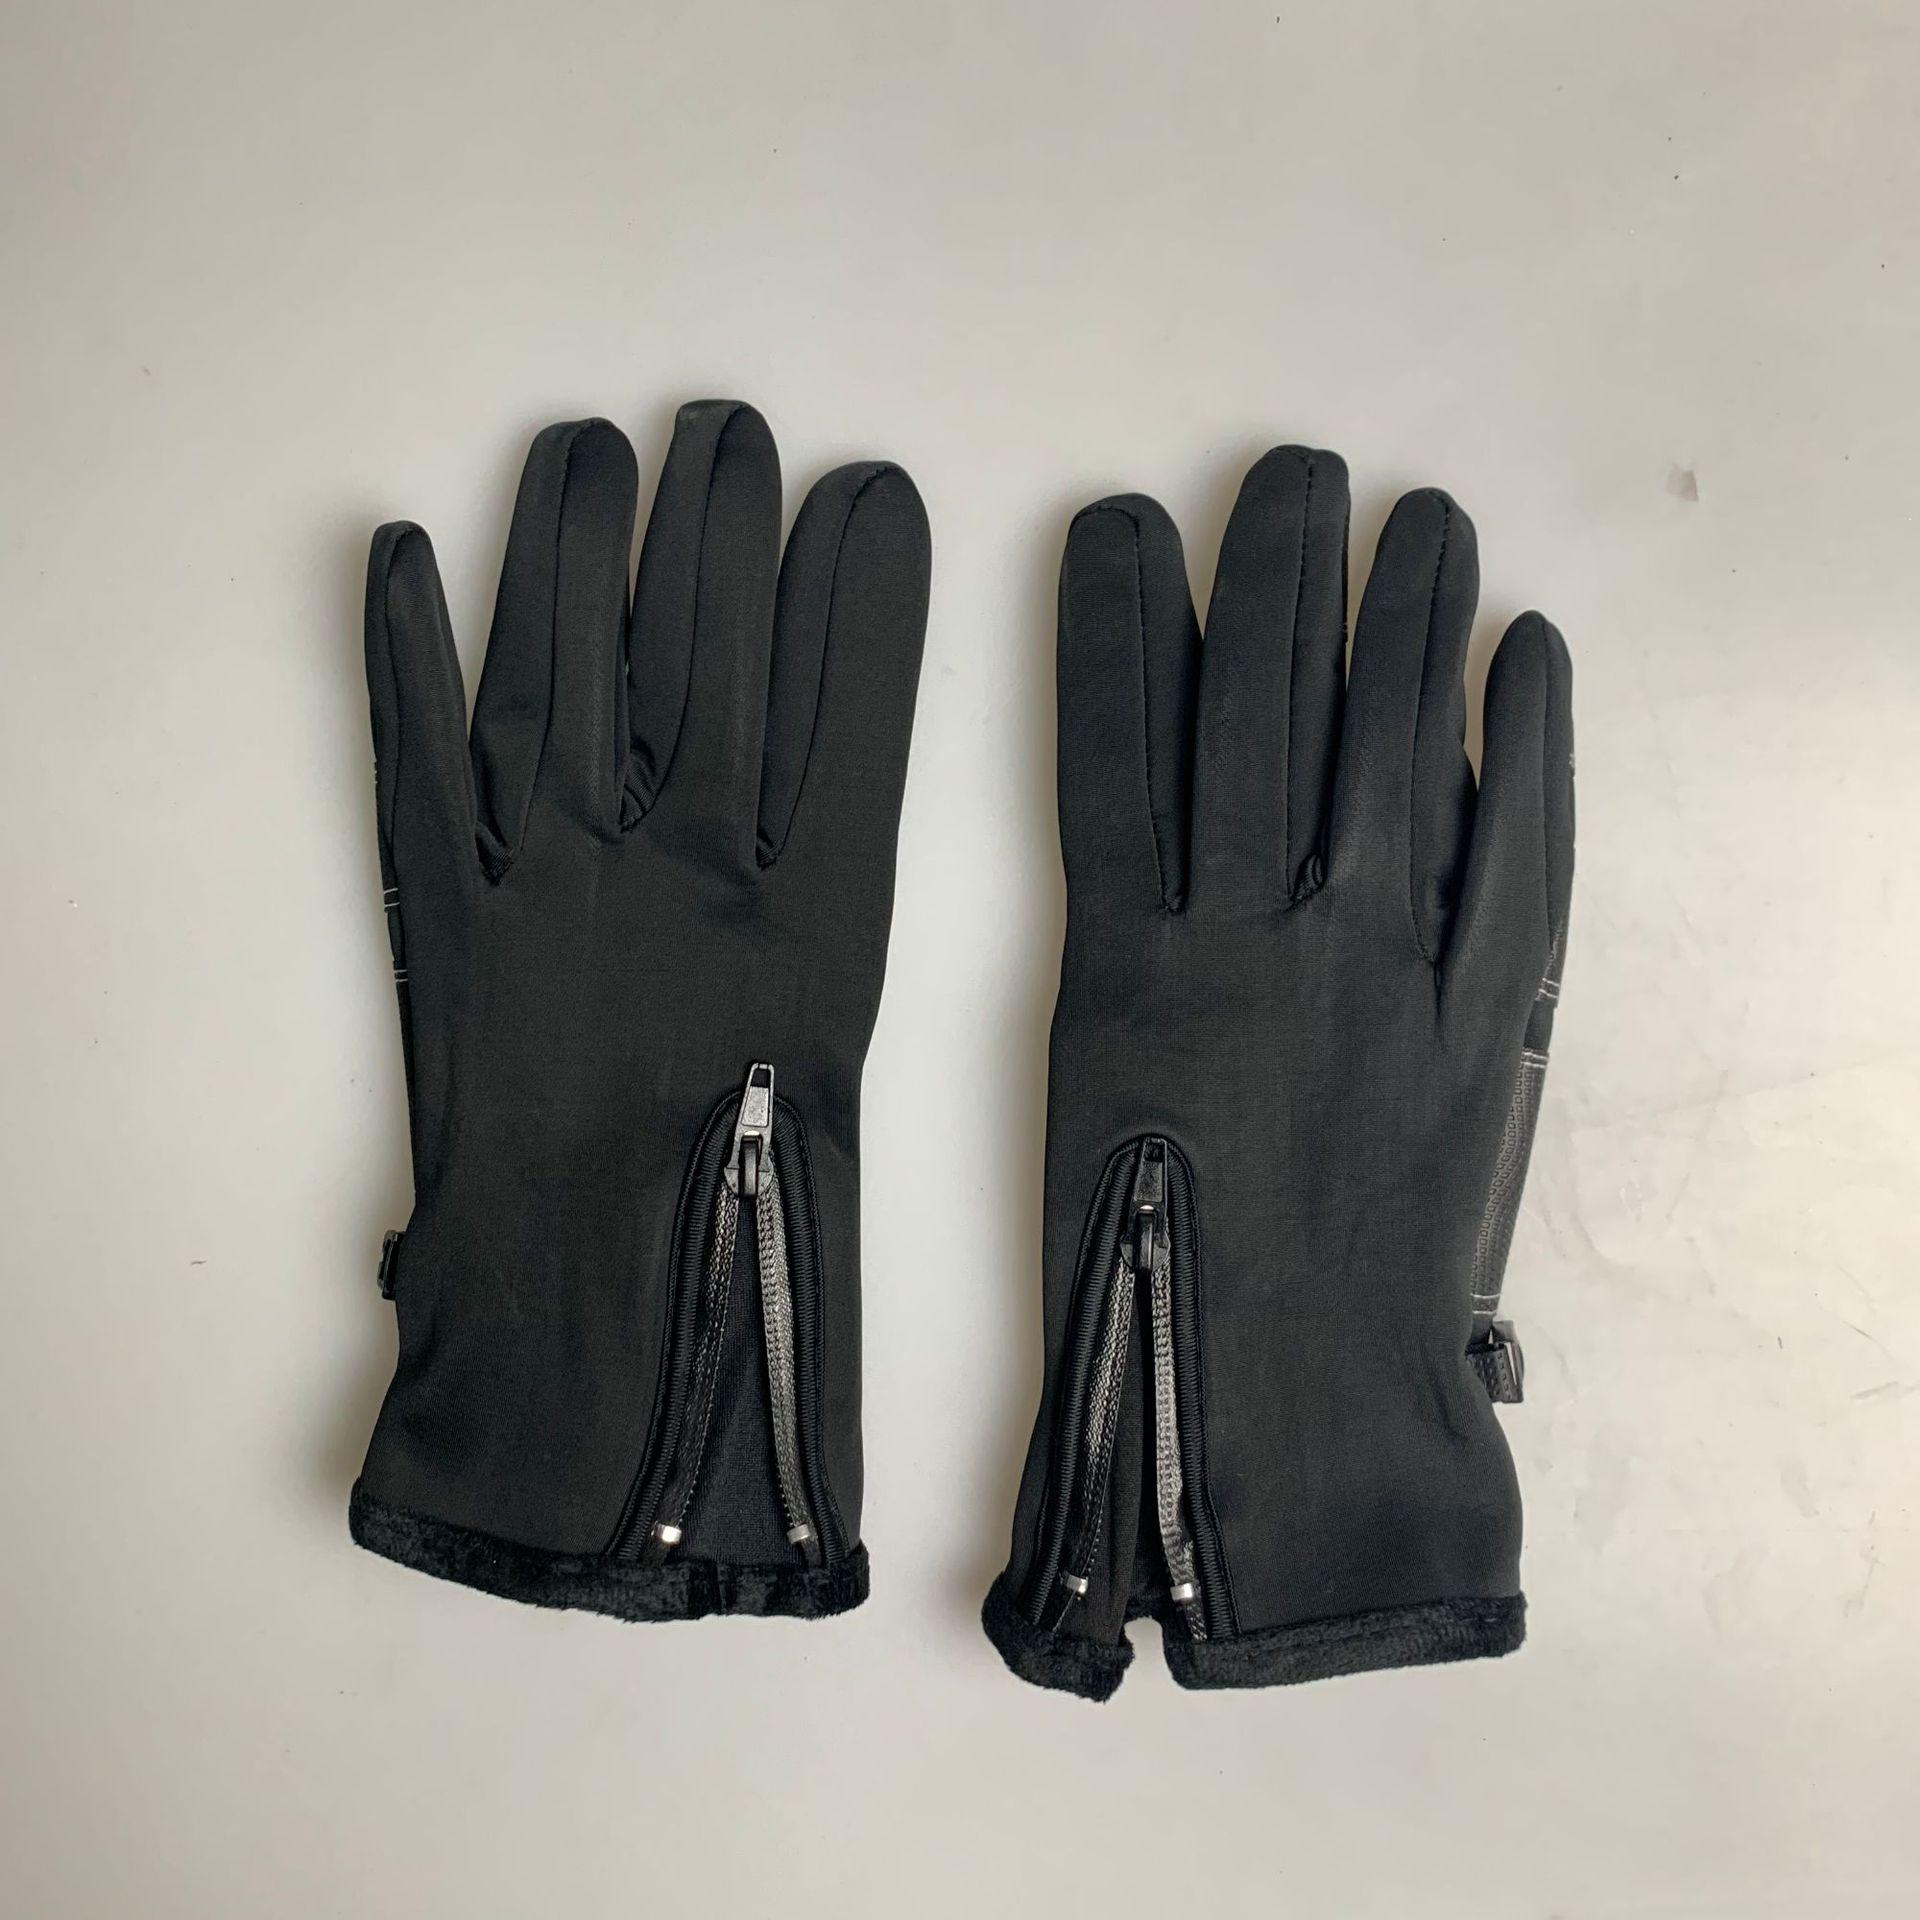 Outdoor Waterproof Gloves Winter Touch Screen Men And Women Windproof Warm Full Finger Zipper Sports Plus Velvet Mountain Climbi